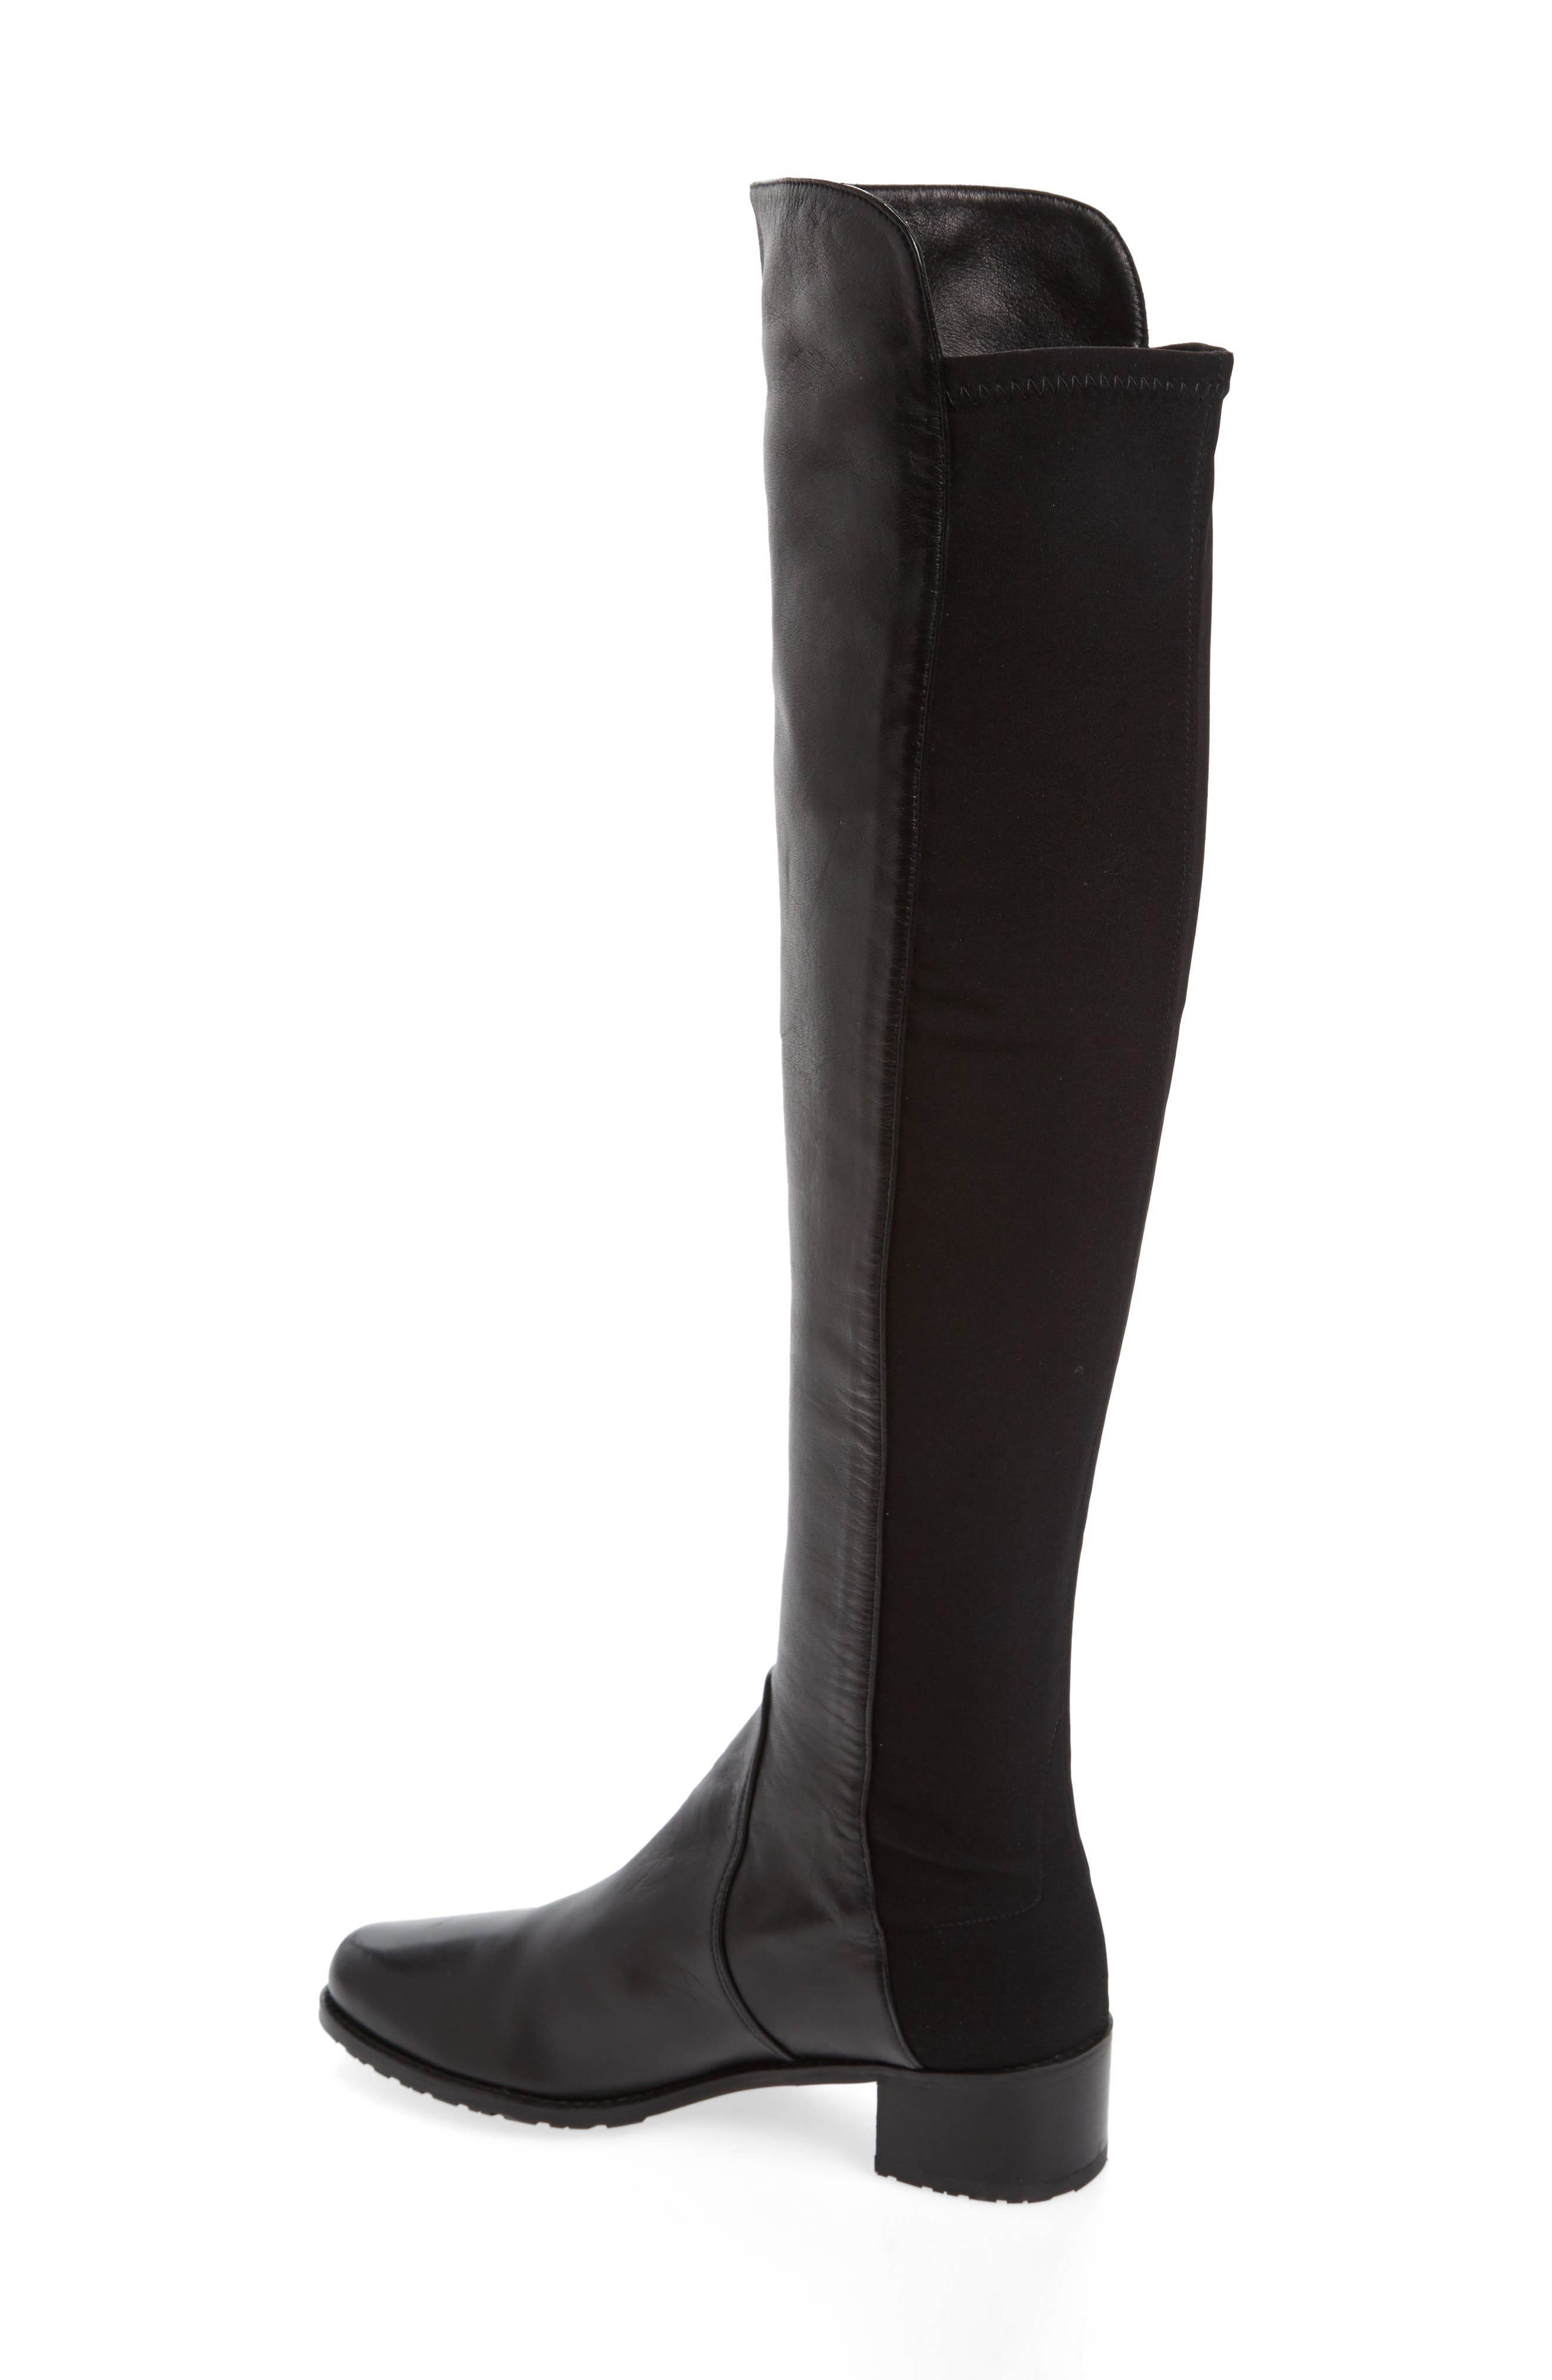 Alternate Image 2  - Stuart Weitzman 'Reserve' Over the Knee Boot (Women)